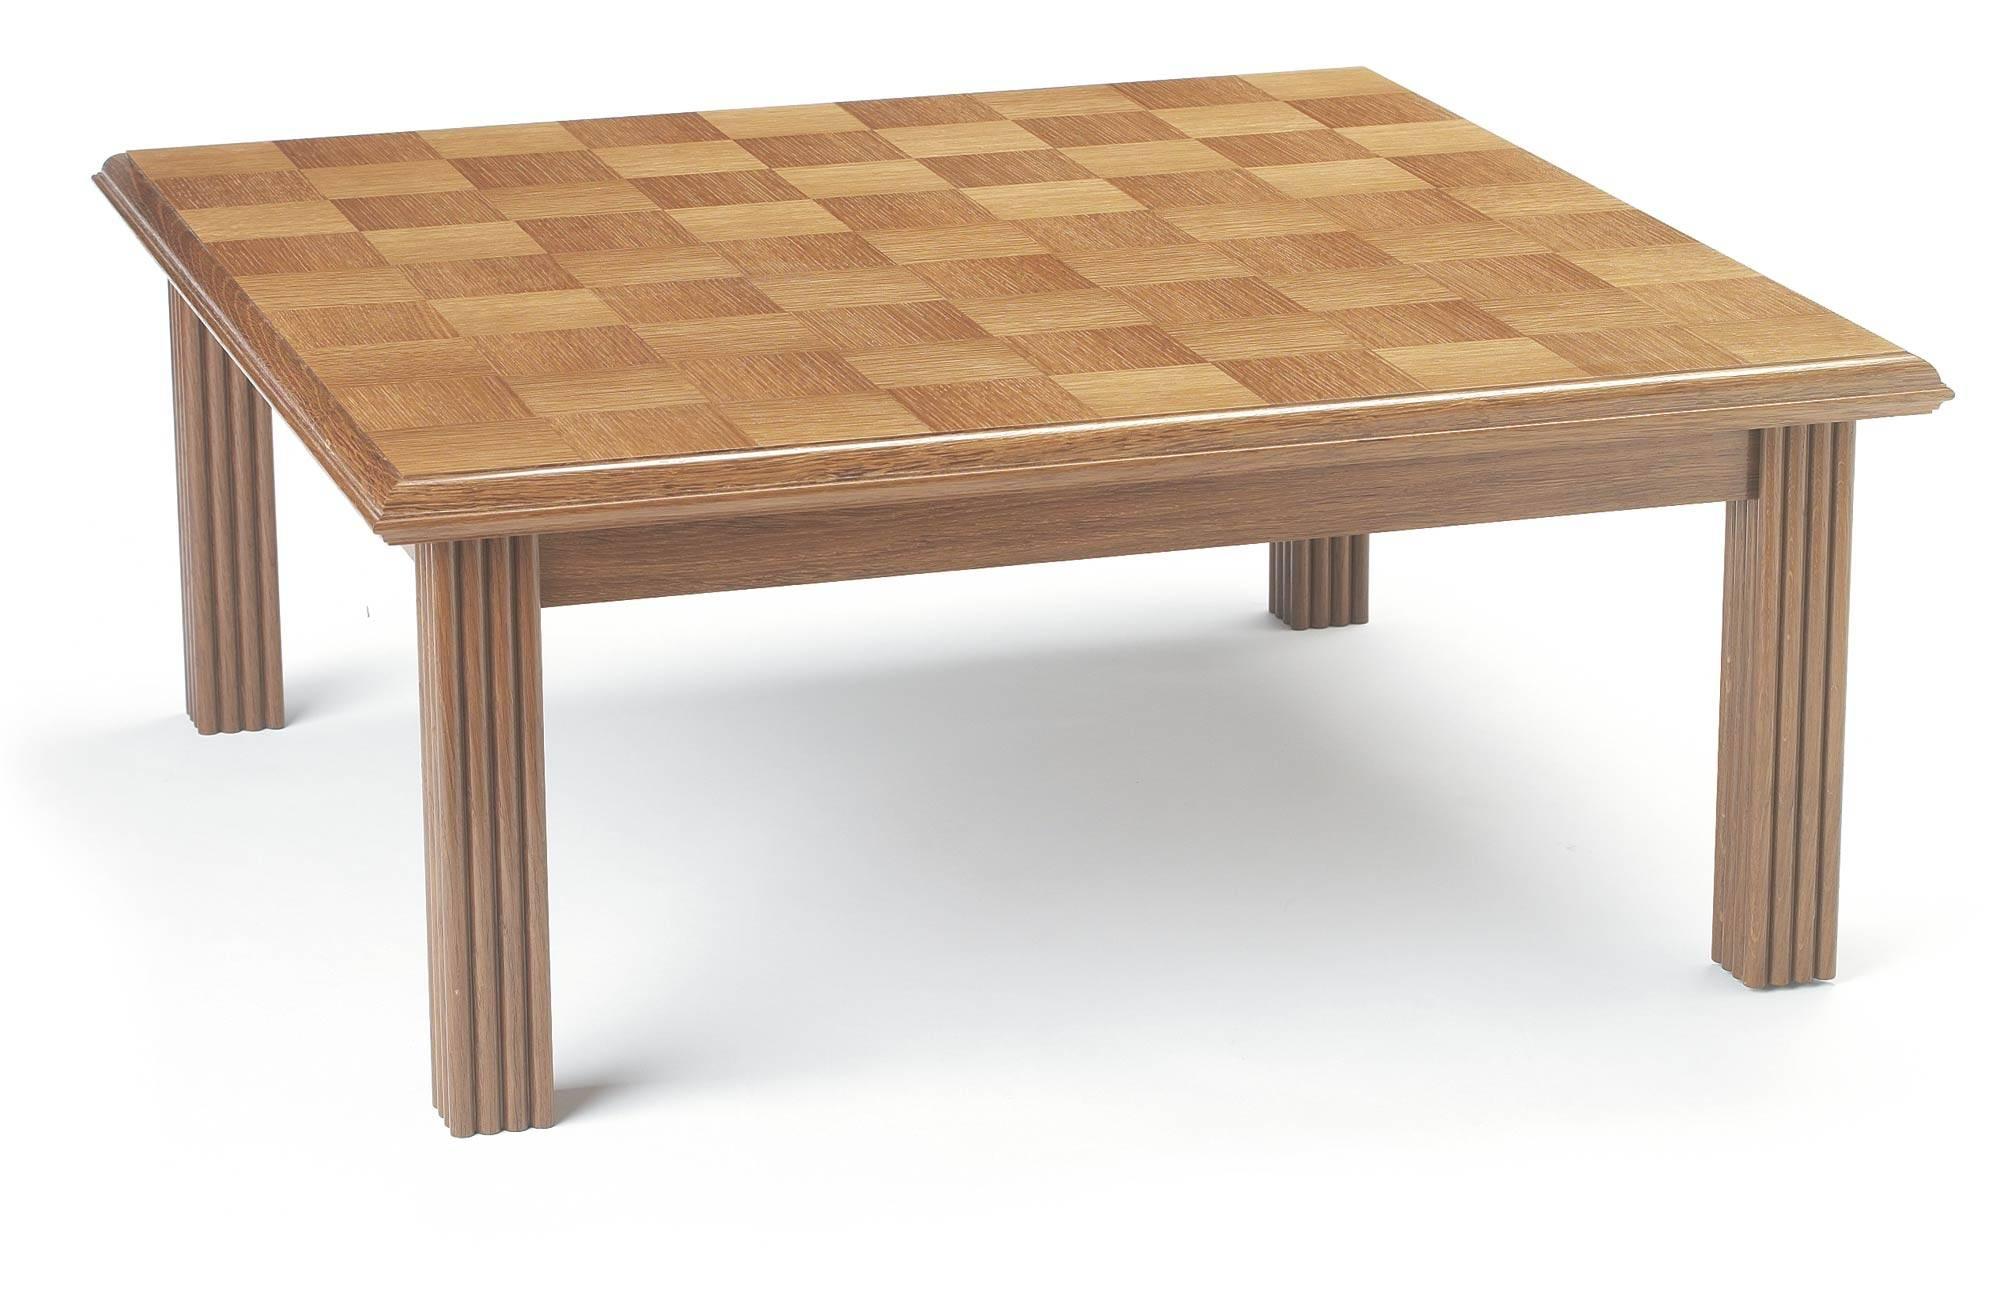 Bespoke Coffee Table In Oak | Makers' Eye within Bespoke Coffee Tables (Image 4 of 30)